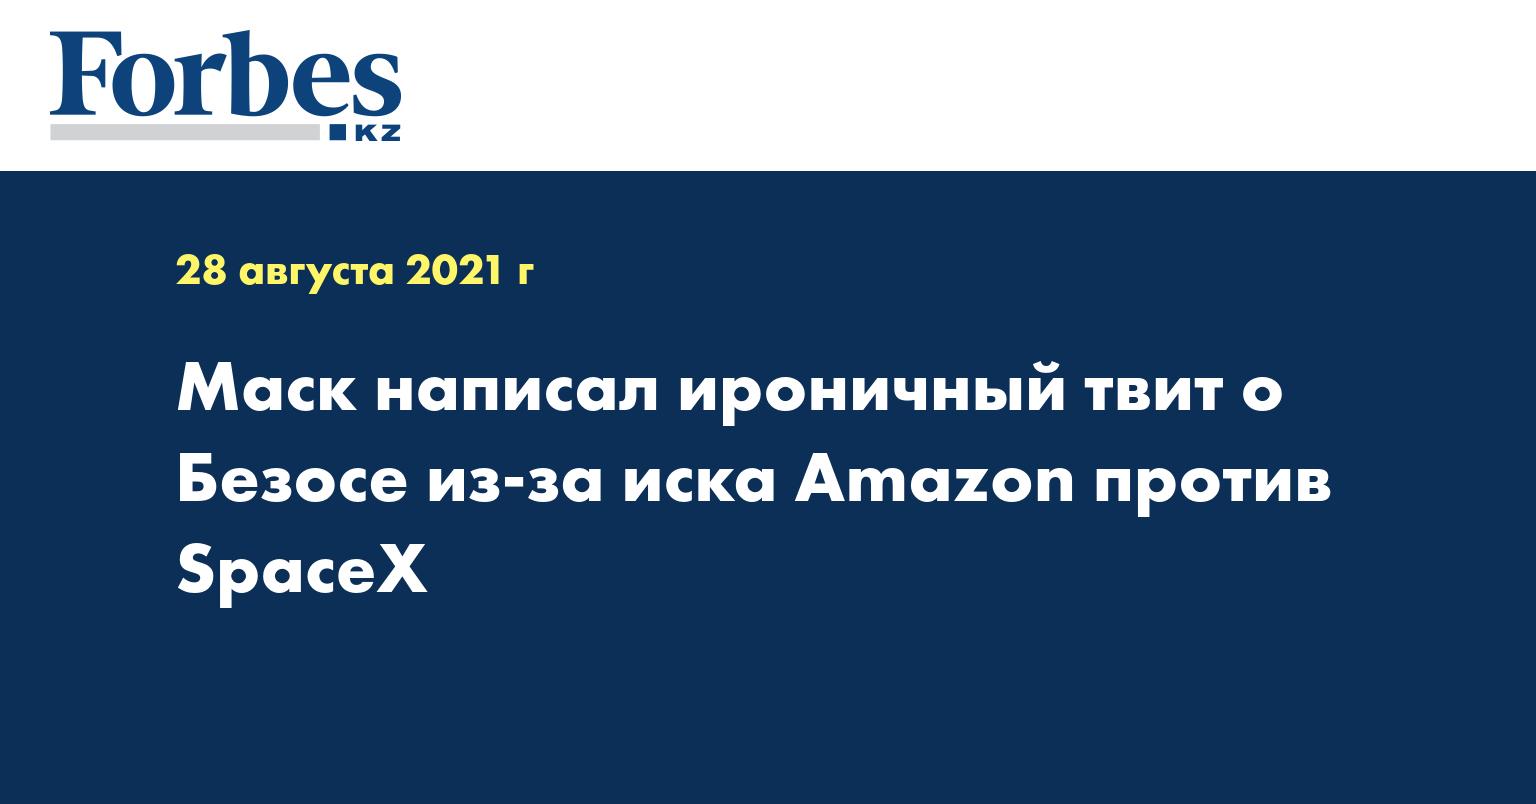 Маск написал ироничный твит о Безосе из-за иска Amazon против SpaceX